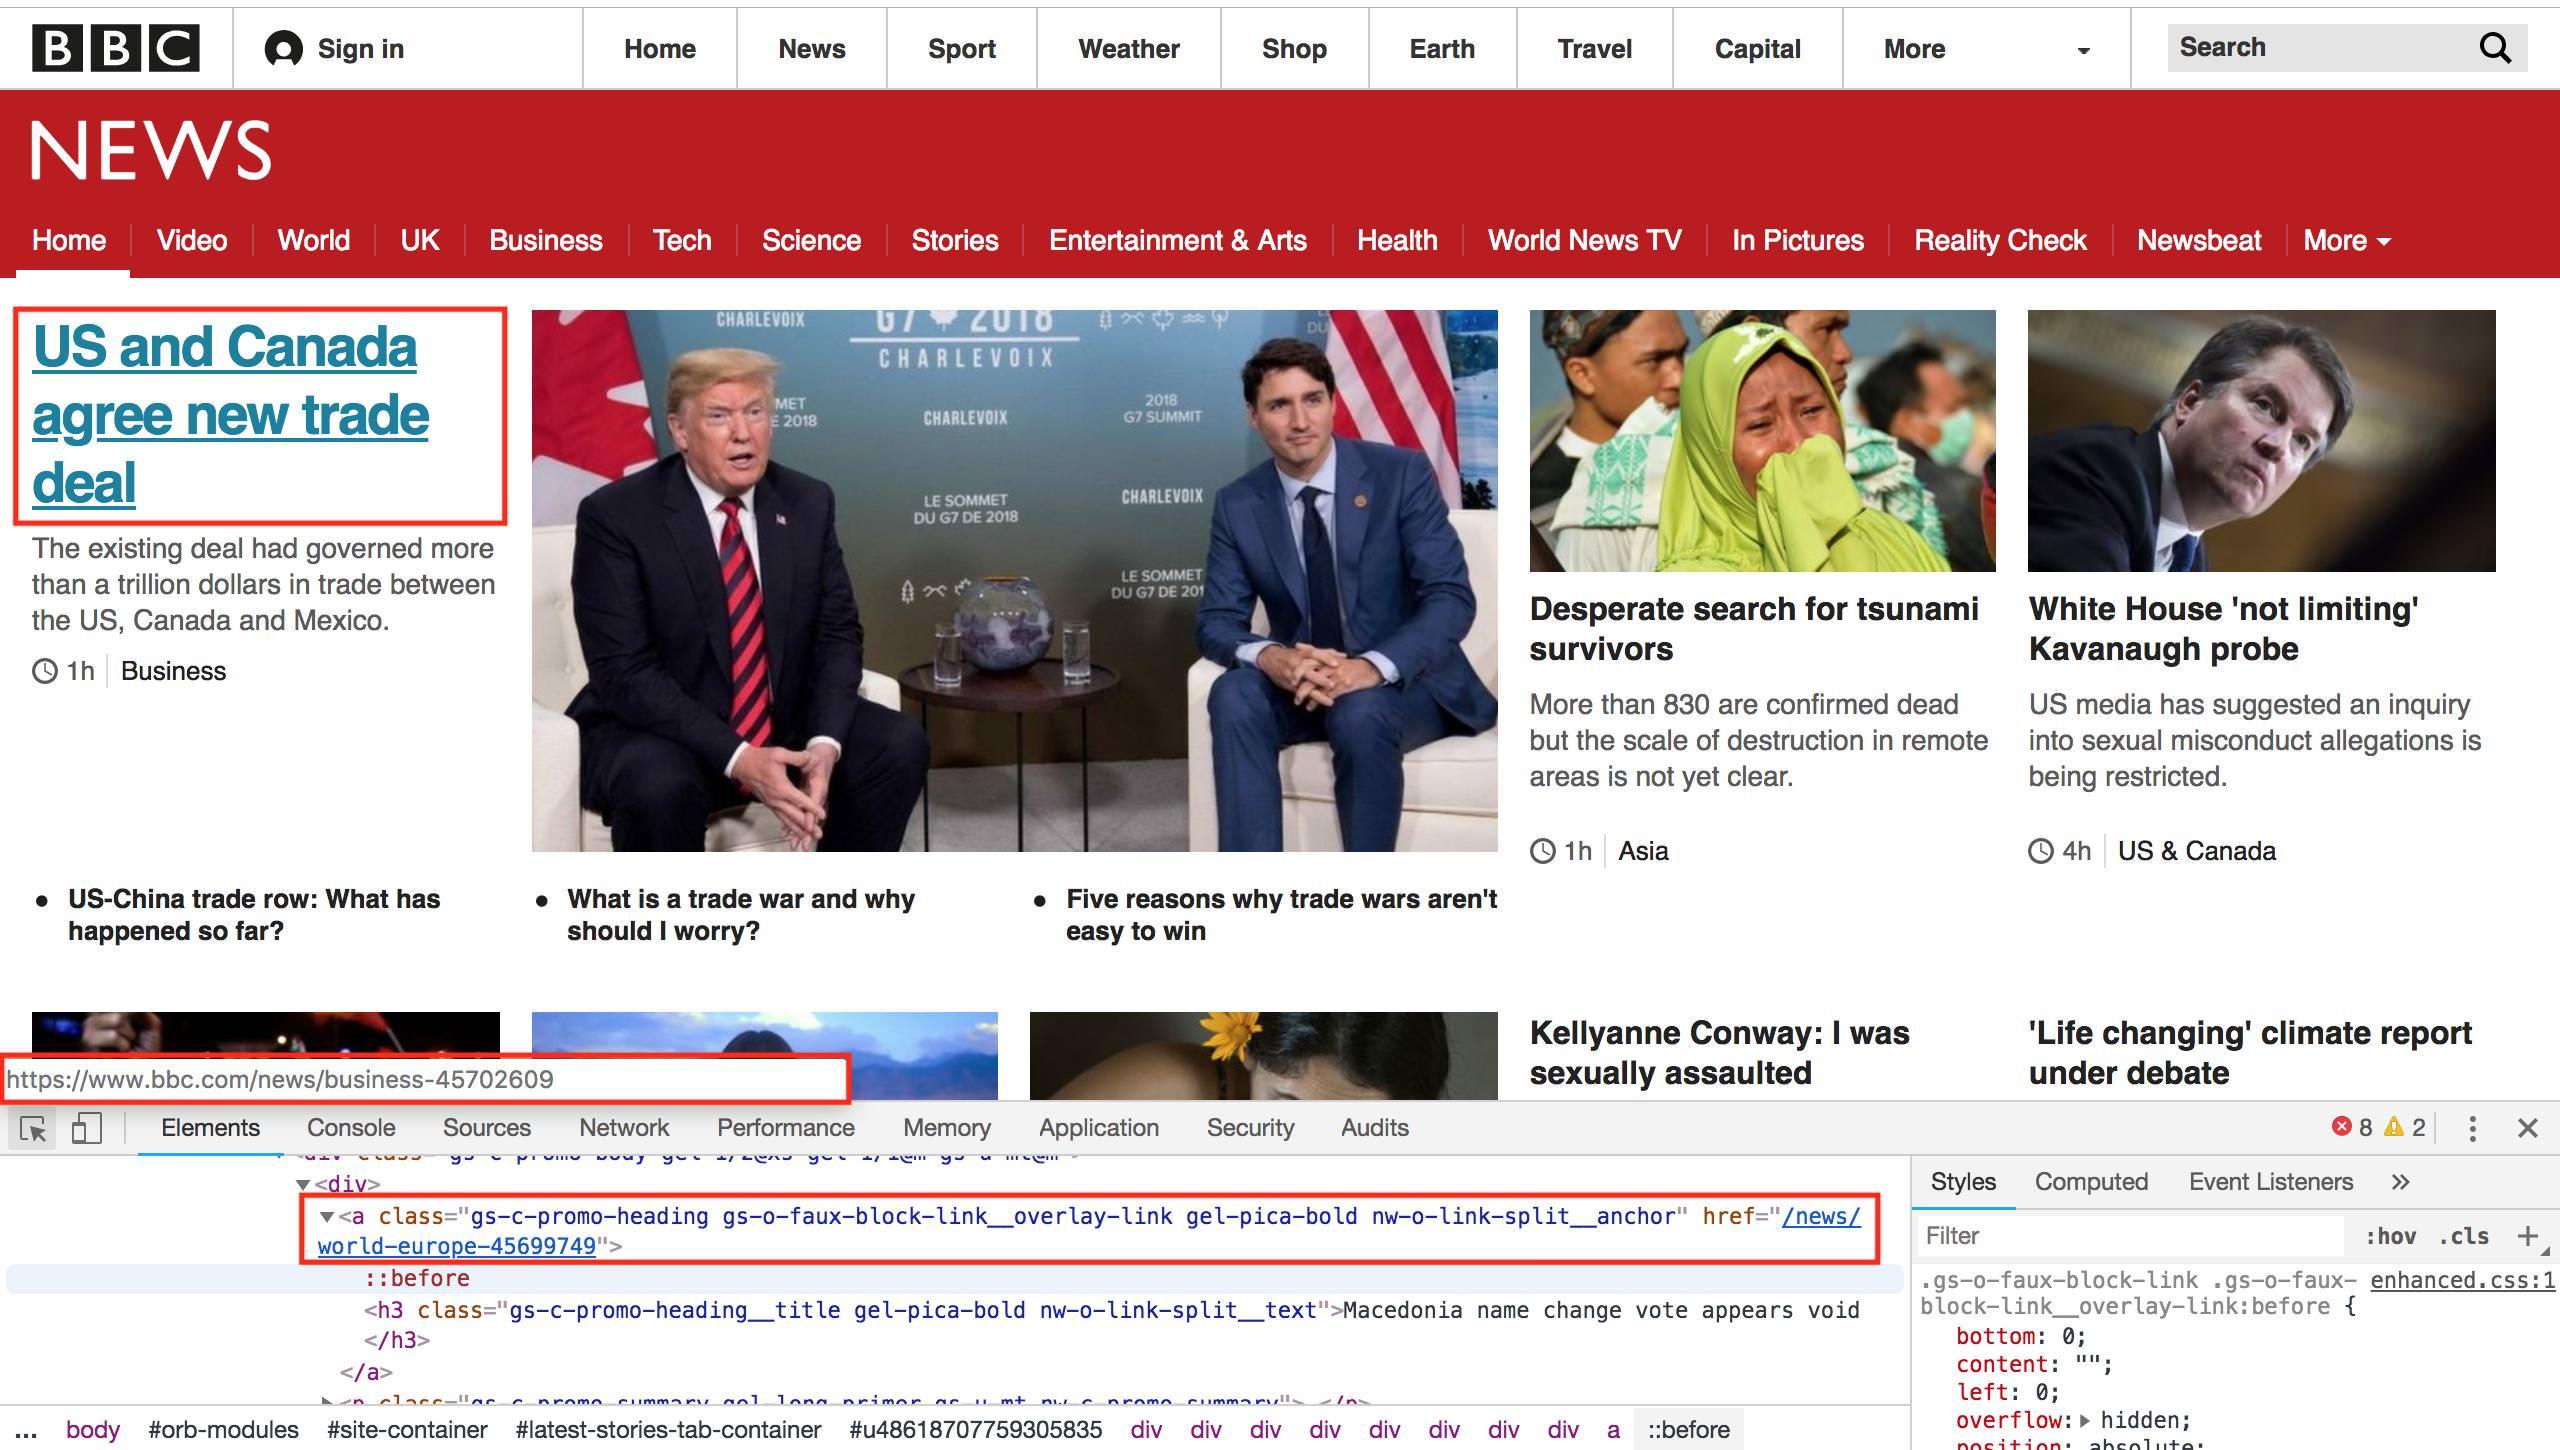 Image 7: Viewing headline links using Developer Tools.